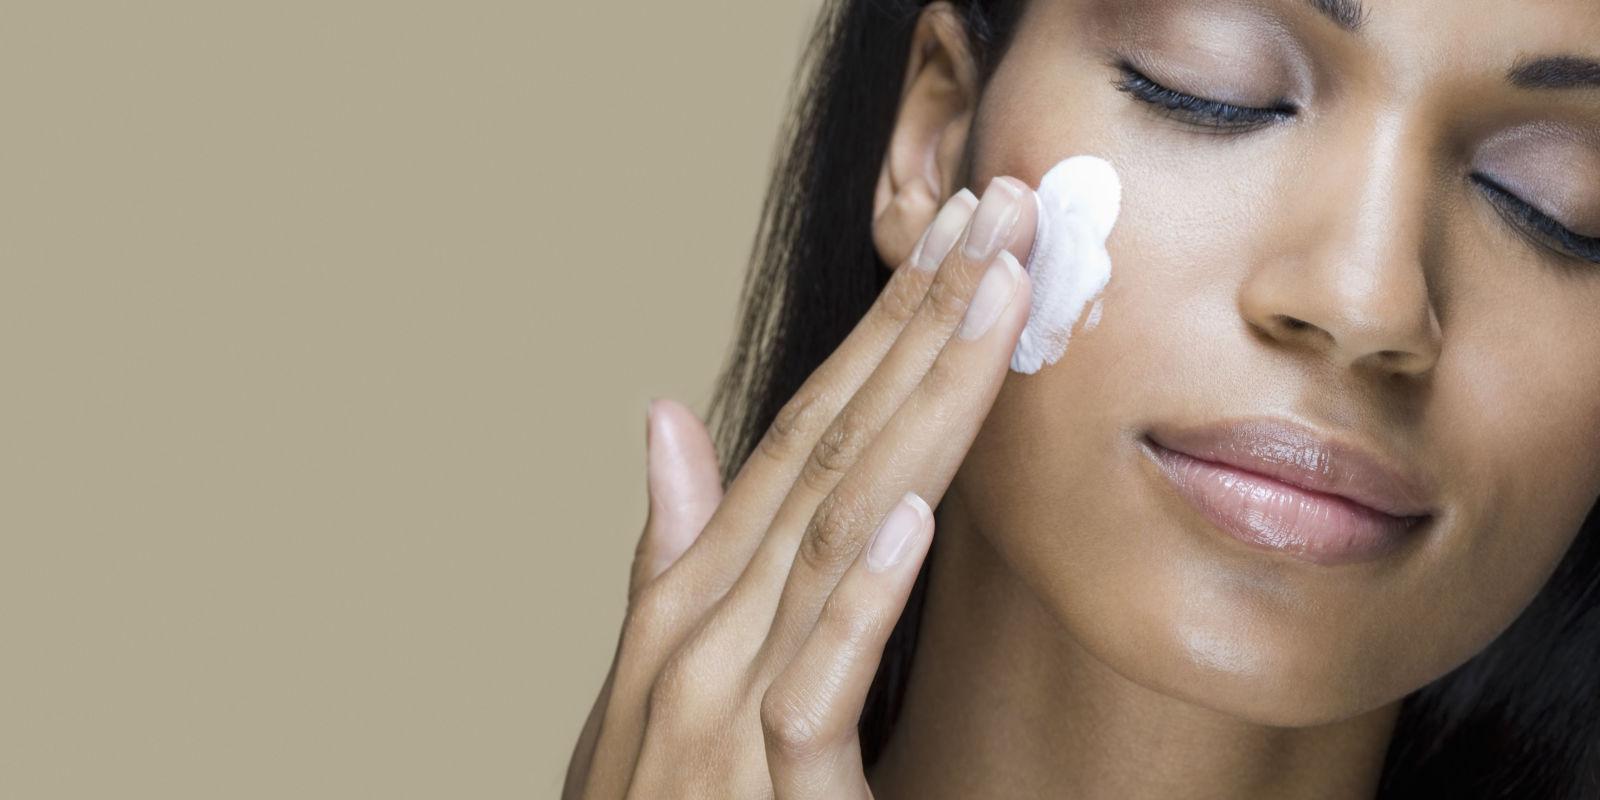 Facial skin lightener for blacks, pic nude transvestites